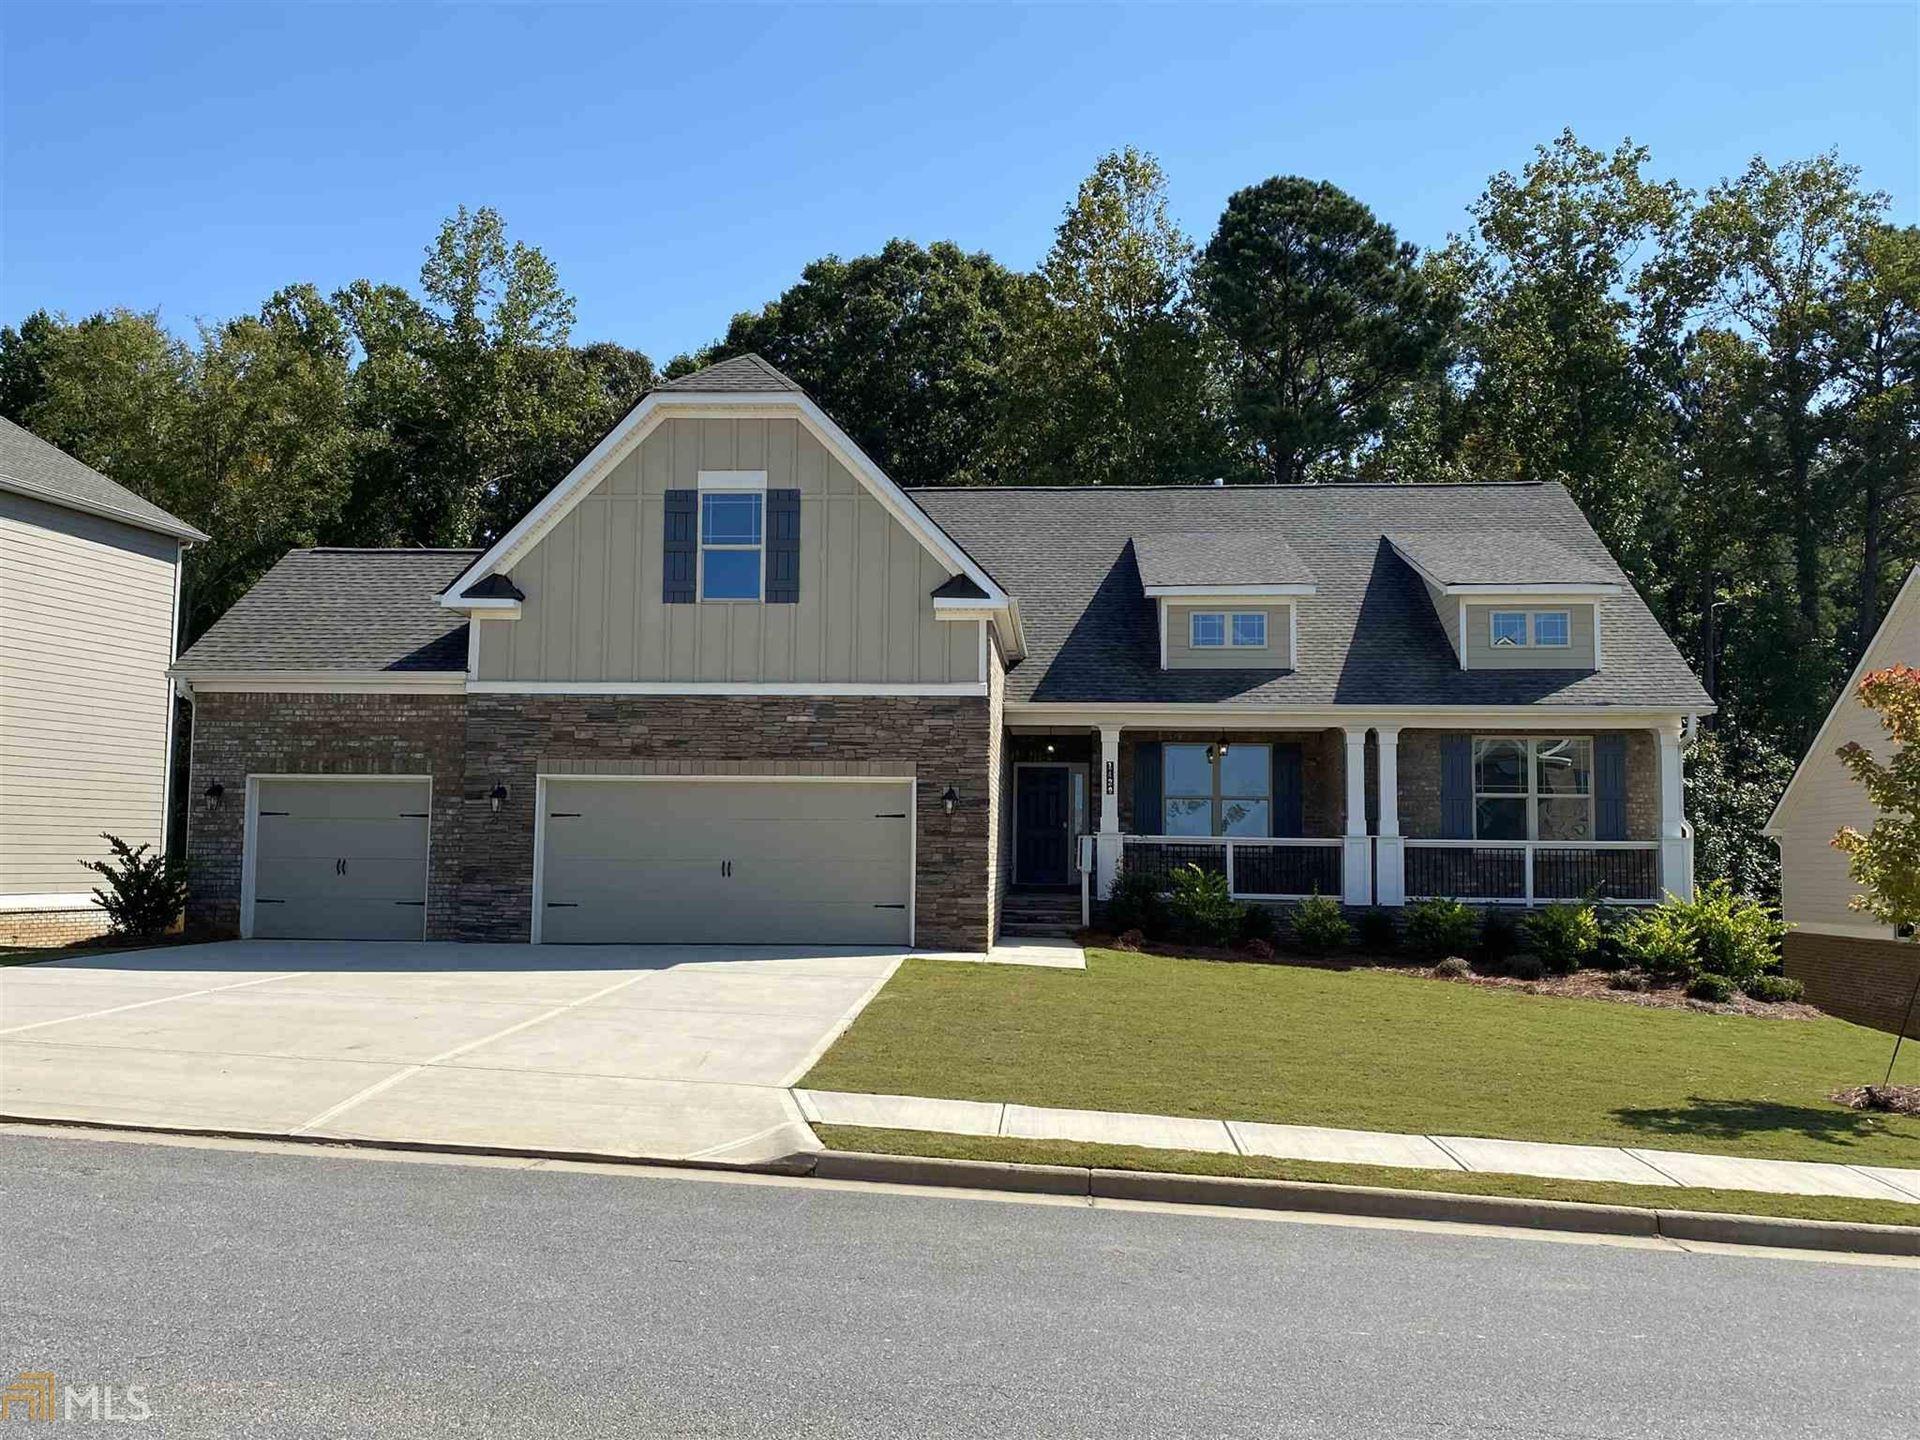 1429 Pond Overlook Dr, Auburn, GA 30011 - #: 8880835